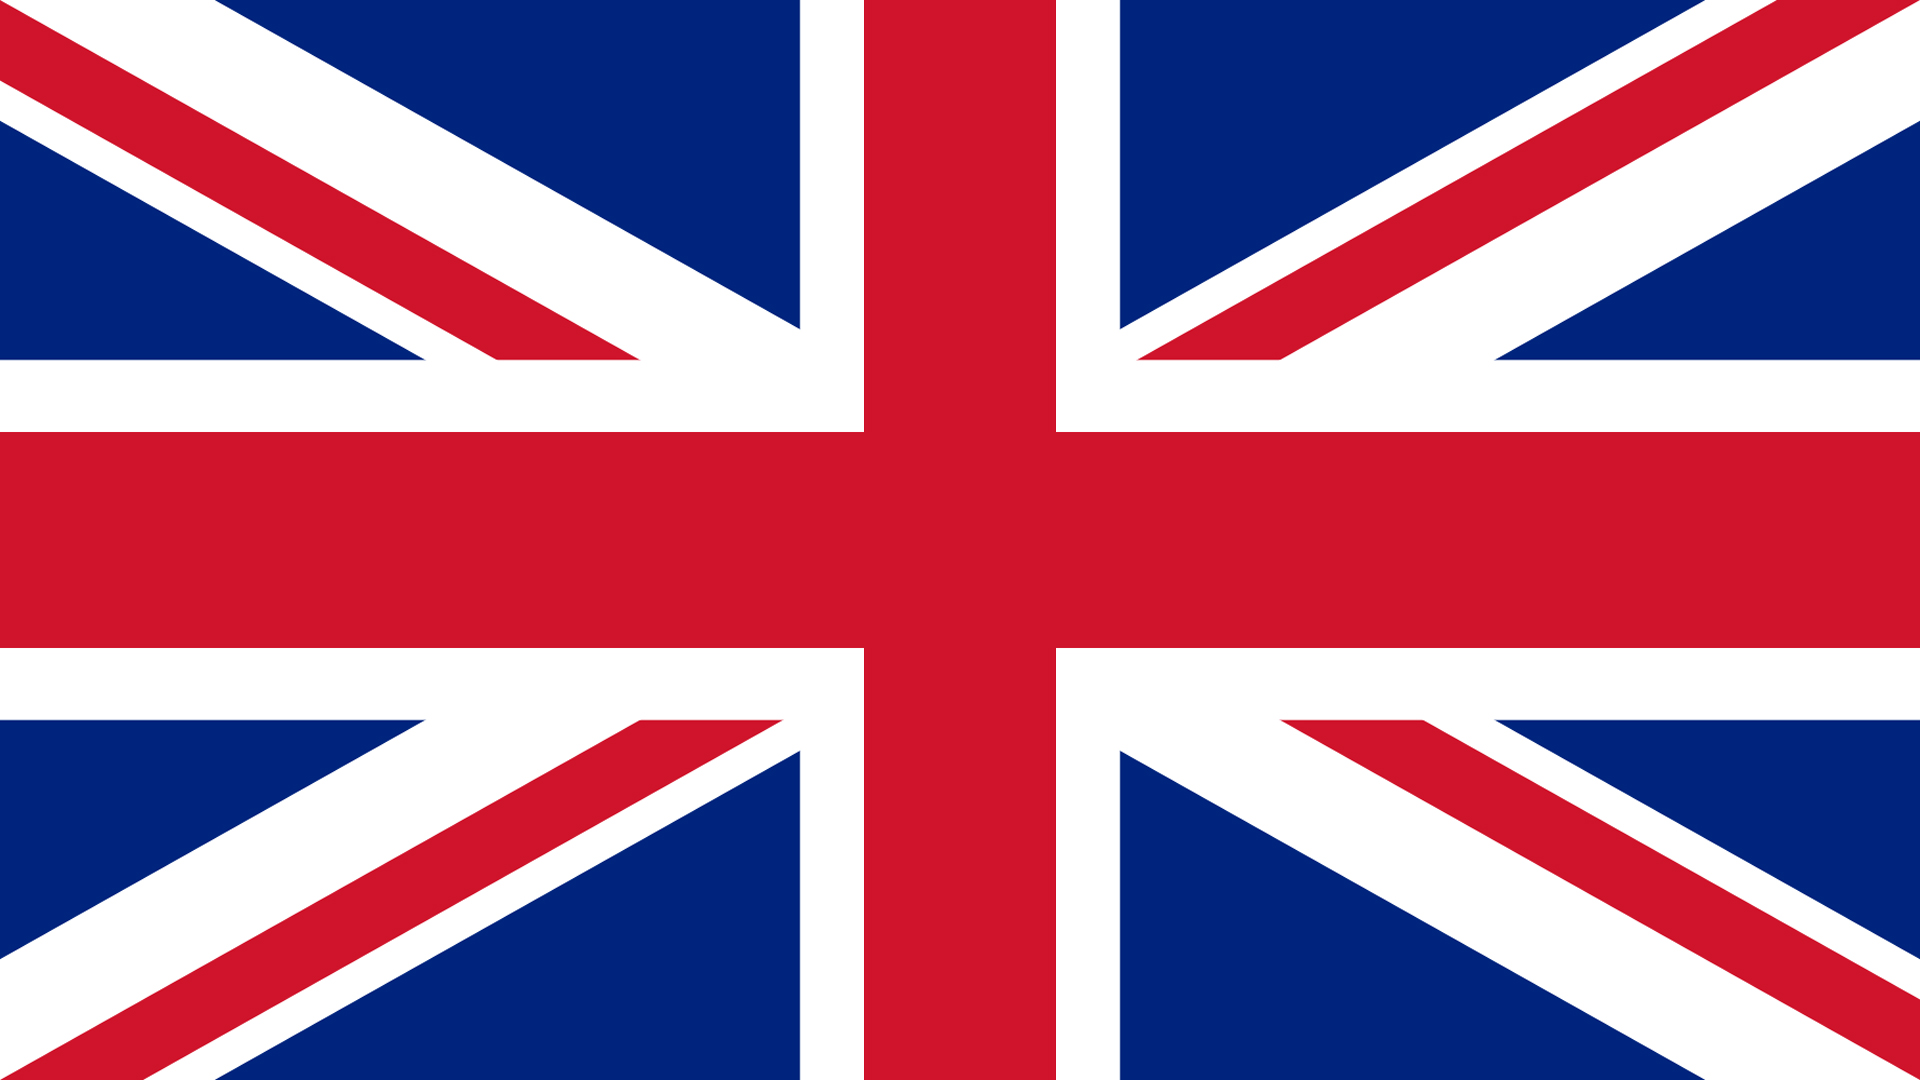 Флаг великобритании британский флаг